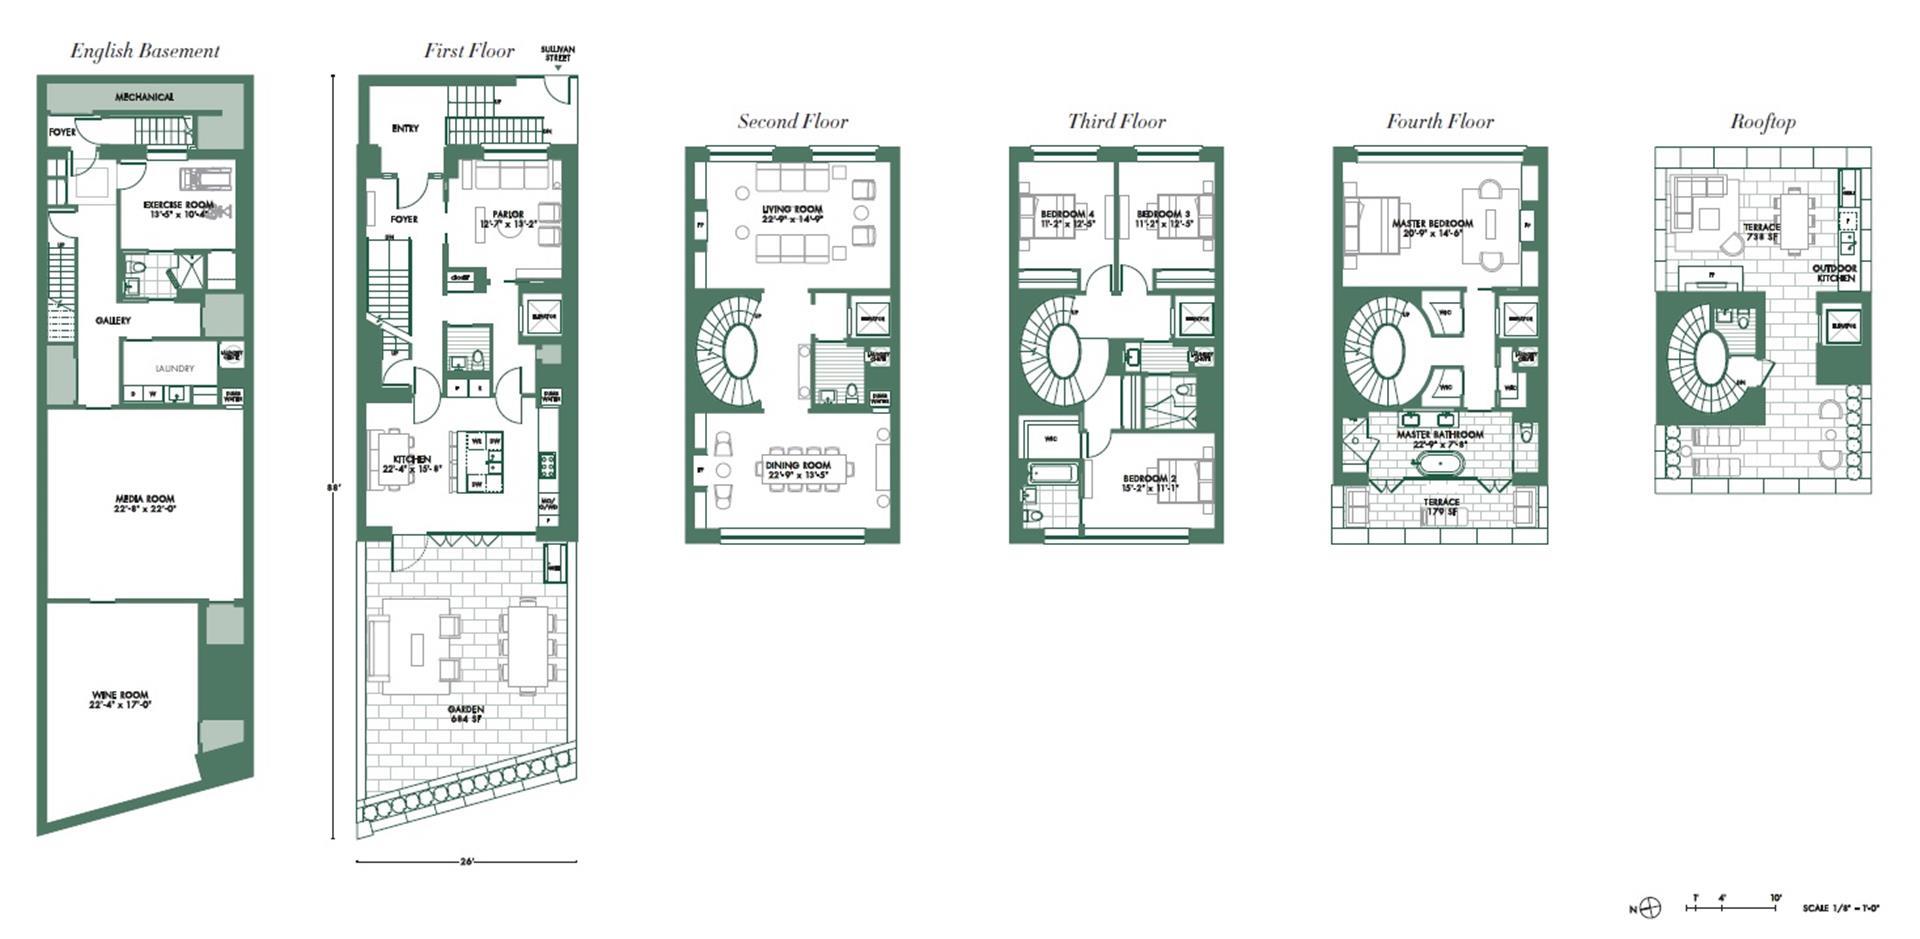 Floor plan of 40 Sullivan Street - SoHo - Nolita, New York